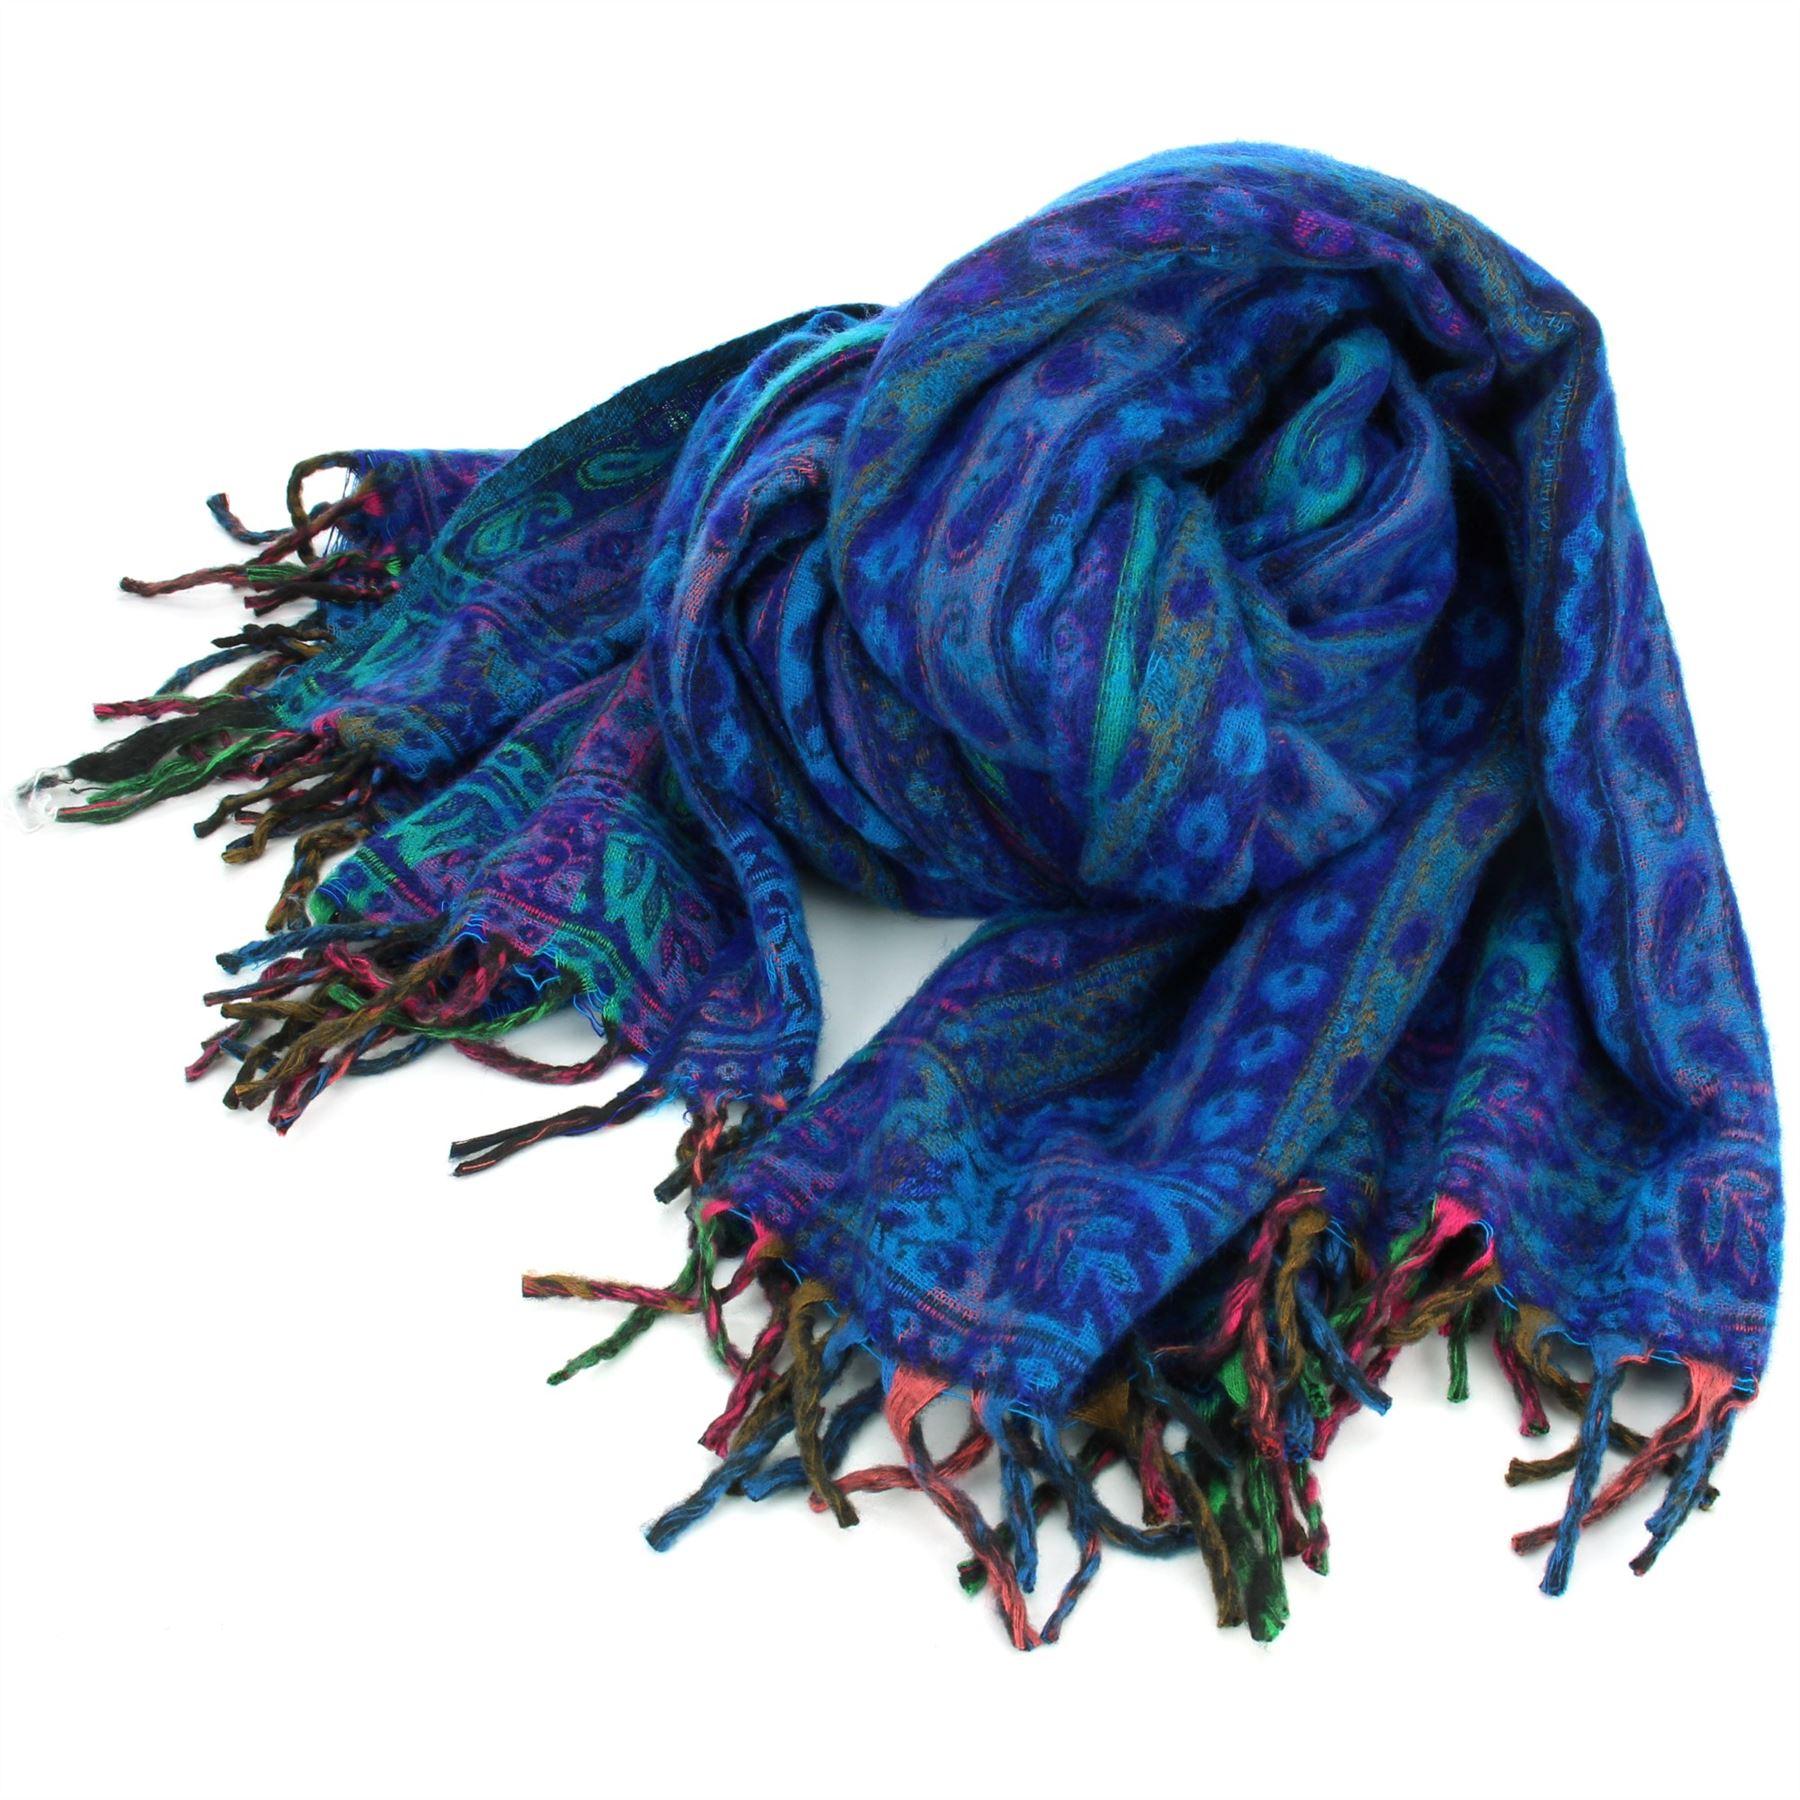 Acrylic-Wool-Blanket-Shawl-Wrap-Throw-Finest-Softest-India-Stripe-Paisley-Travel thumbnail 5